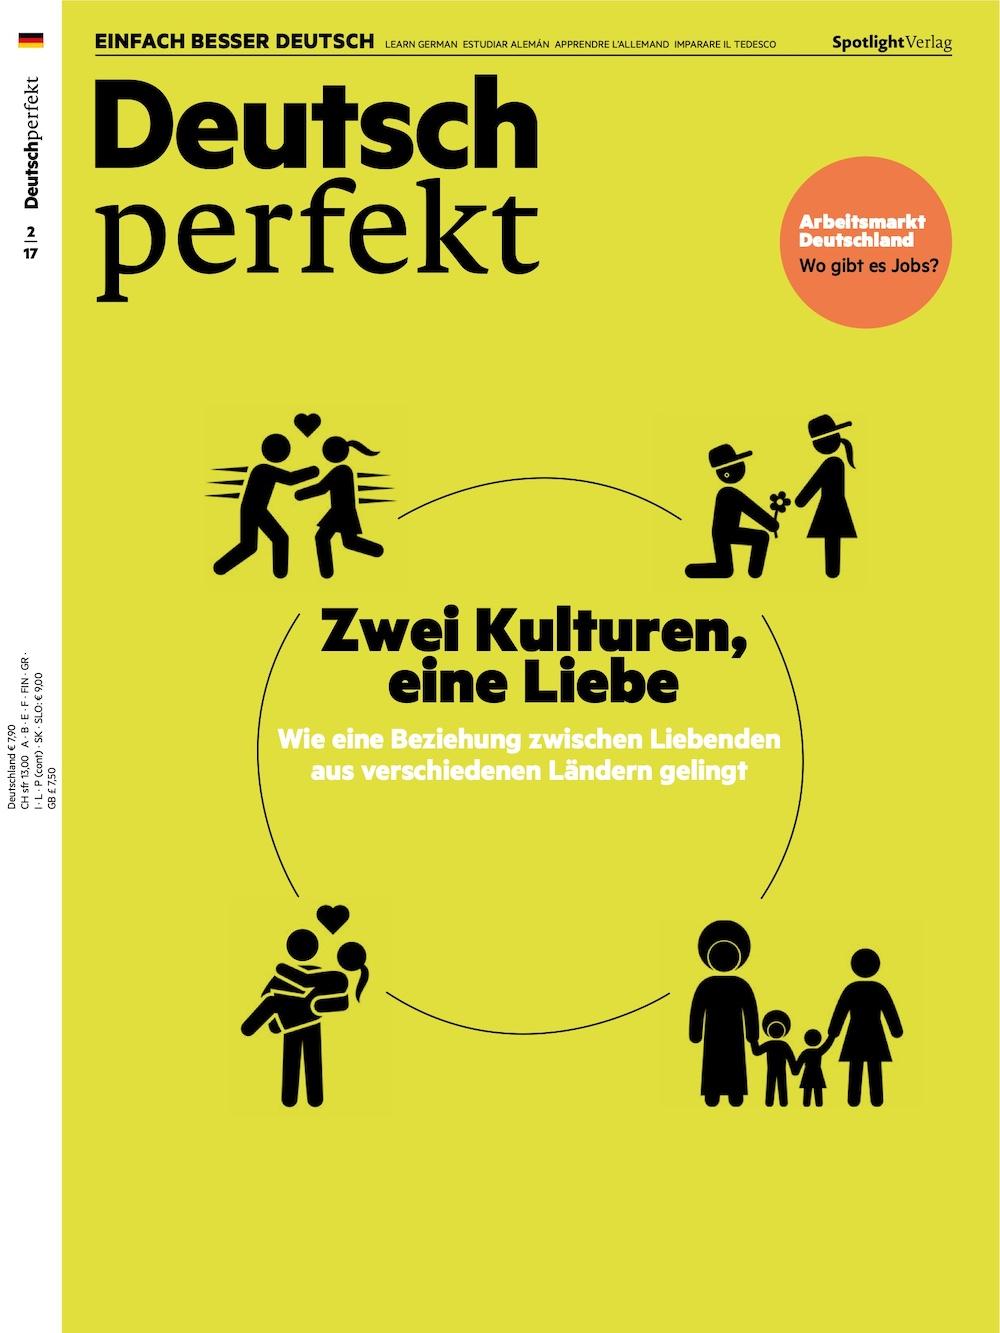 Deutsch Perfekt 2017-02